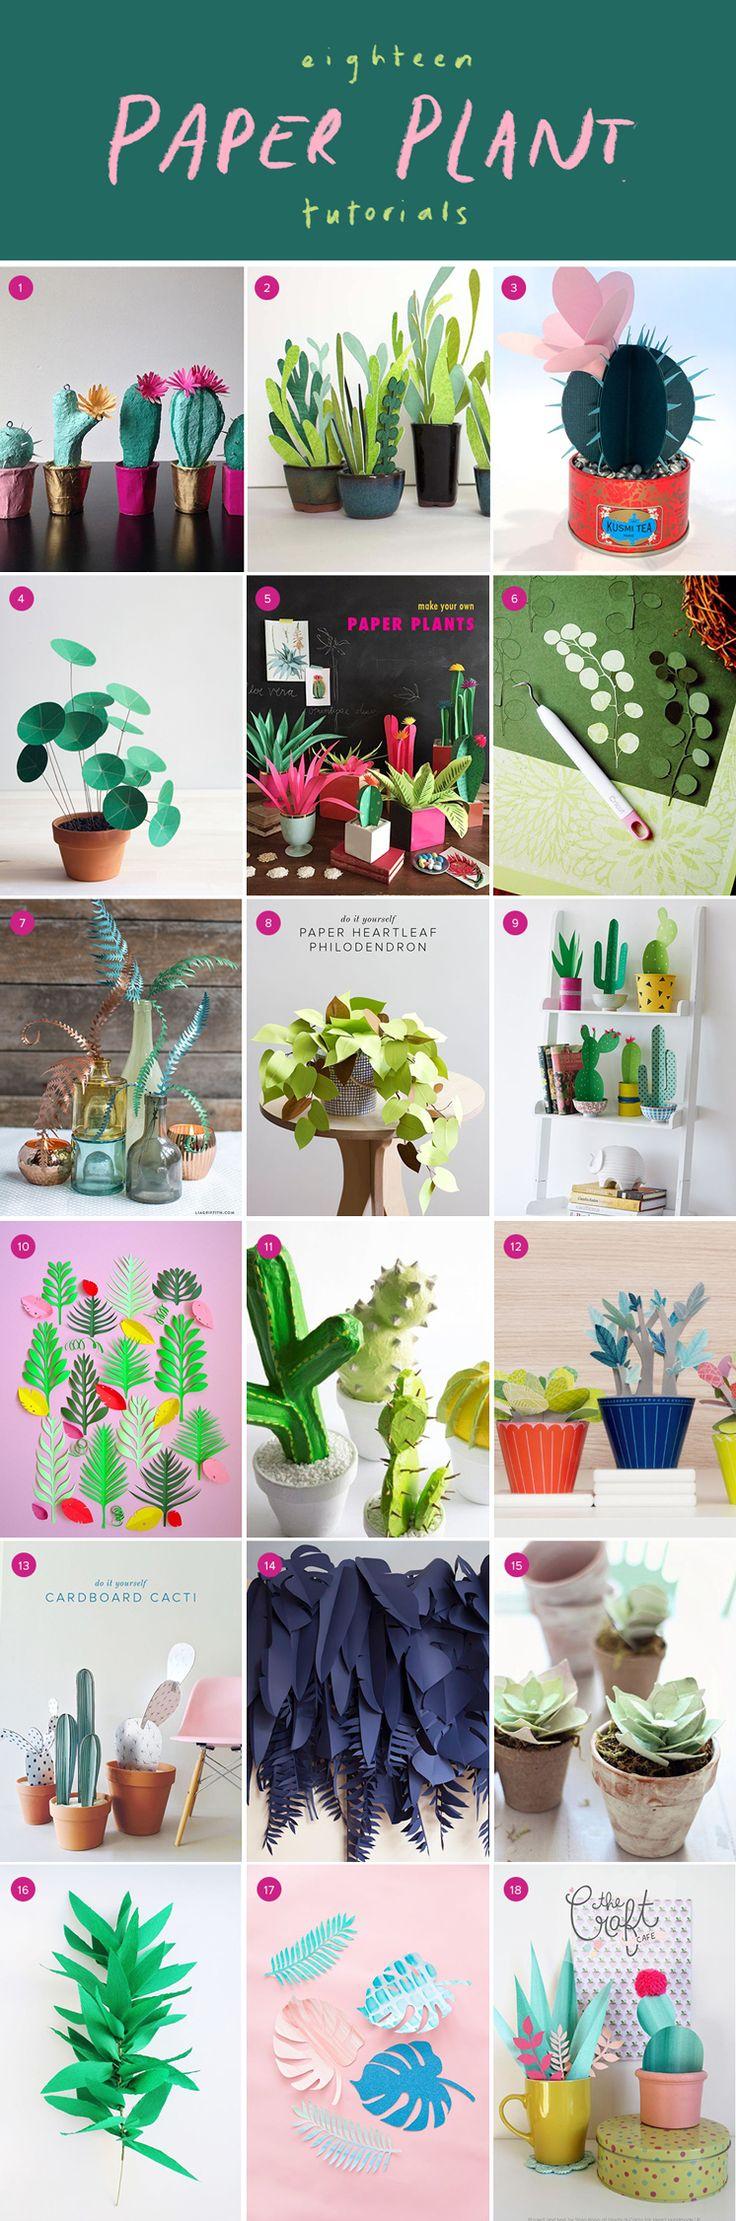 18 BEST PAPER PLANT TUTORIALS | www.homeology.co.za